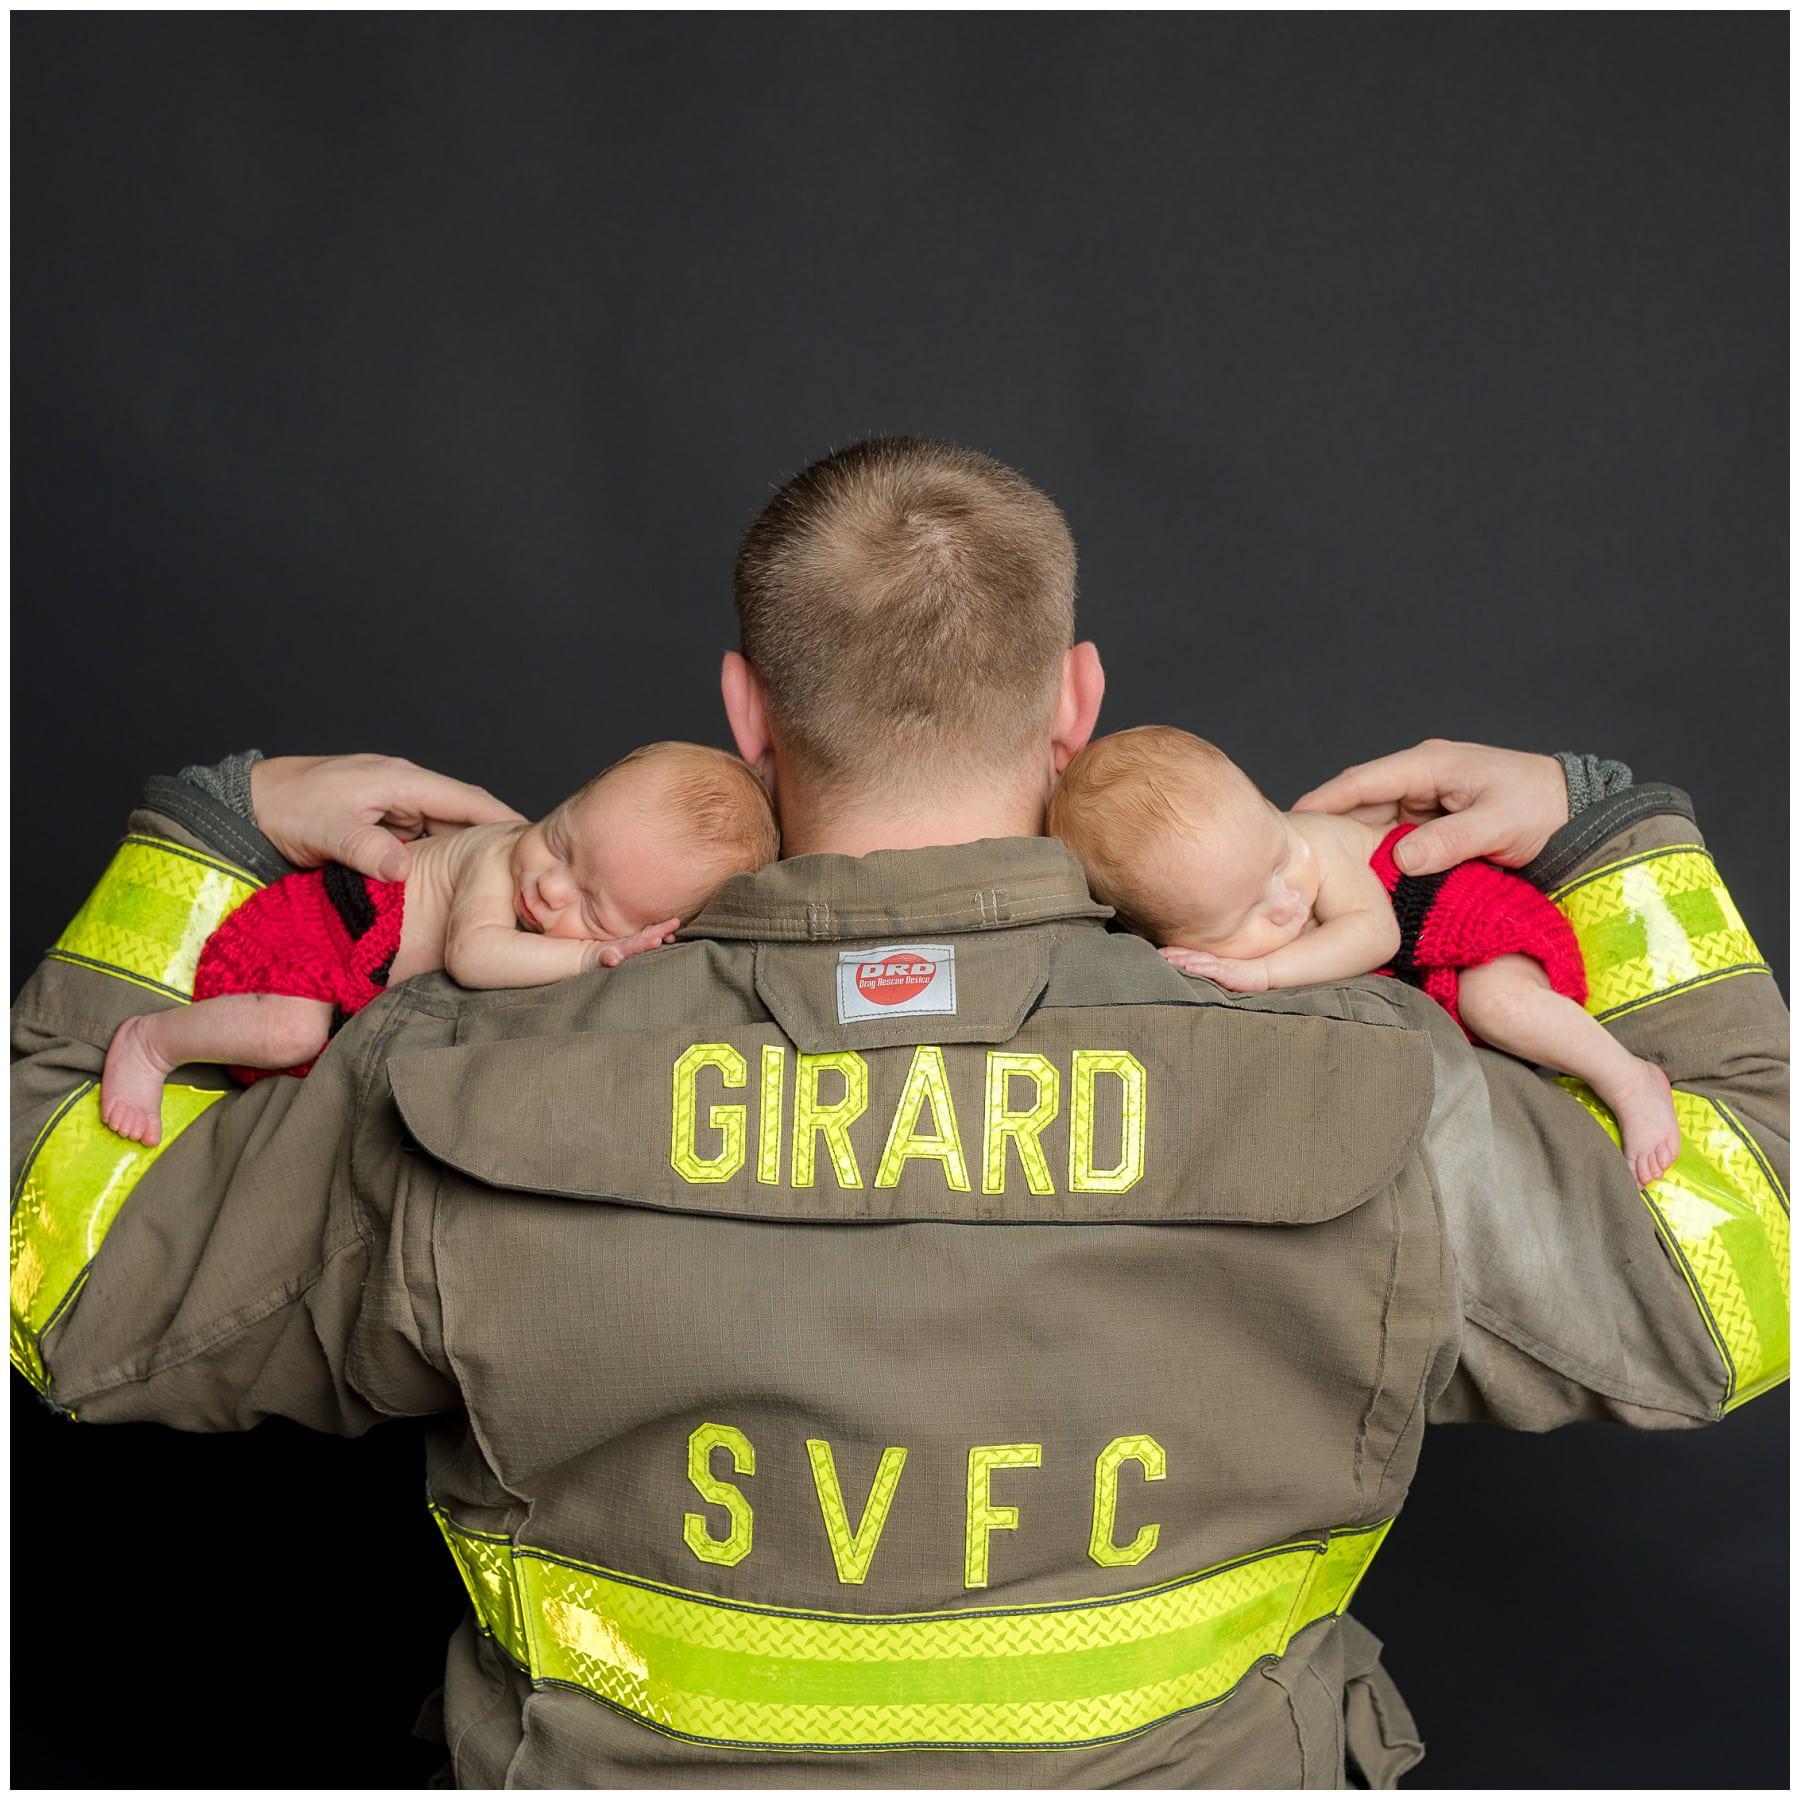 firefighter themed newborn twin photo in studio